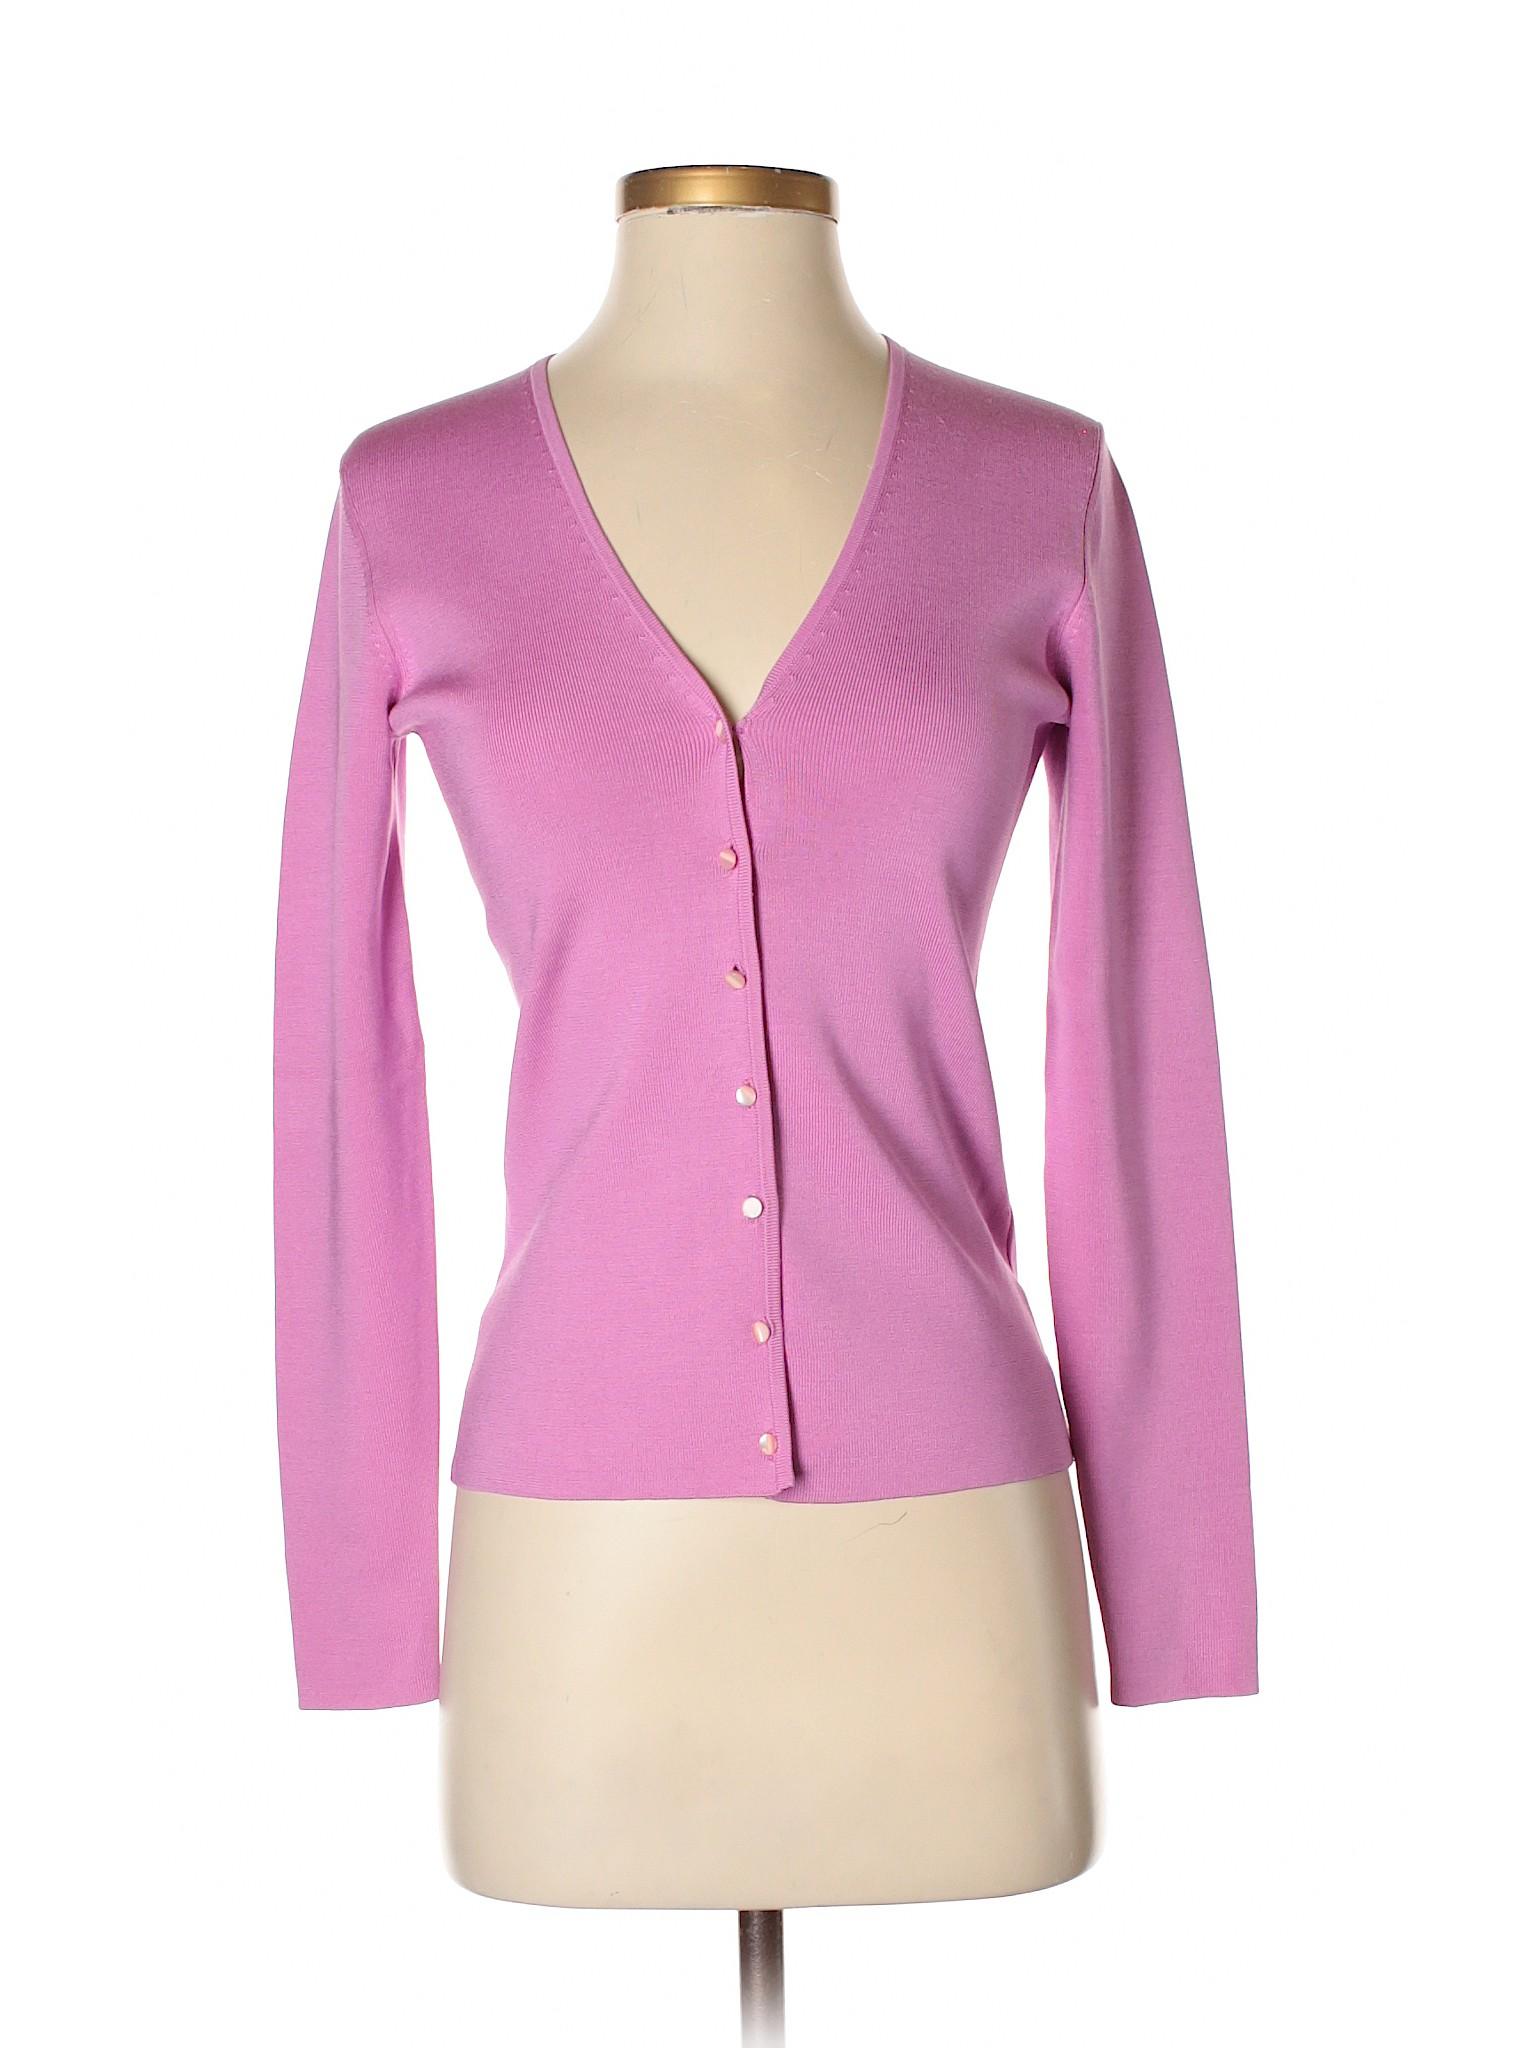 Taylor Ann Boutique Silk Boutique Cardigan Ann zwYw7qt